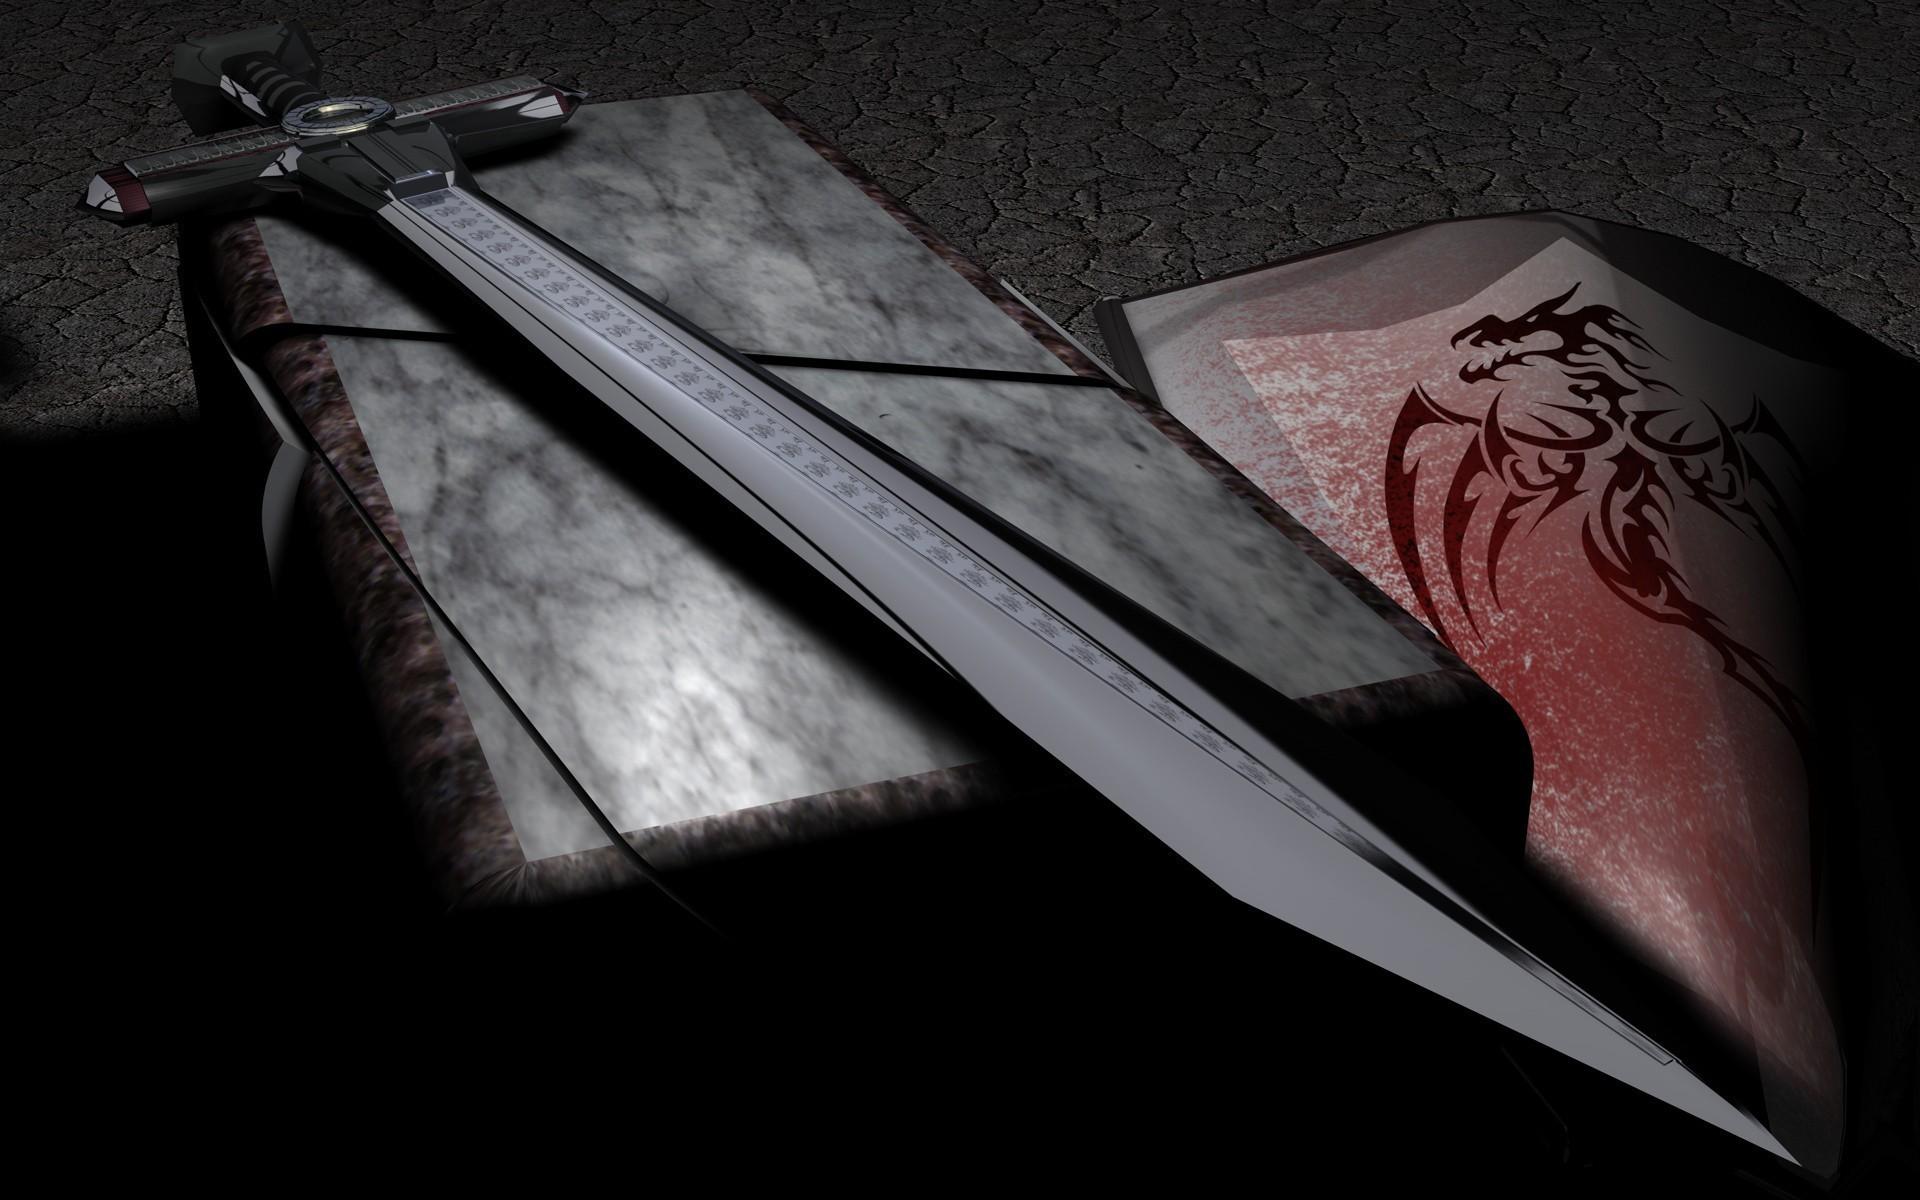 1920x1200 Black Samurai Sword Wallpaper HD #10974 Wallpaper | High Resolution . 1920x1200